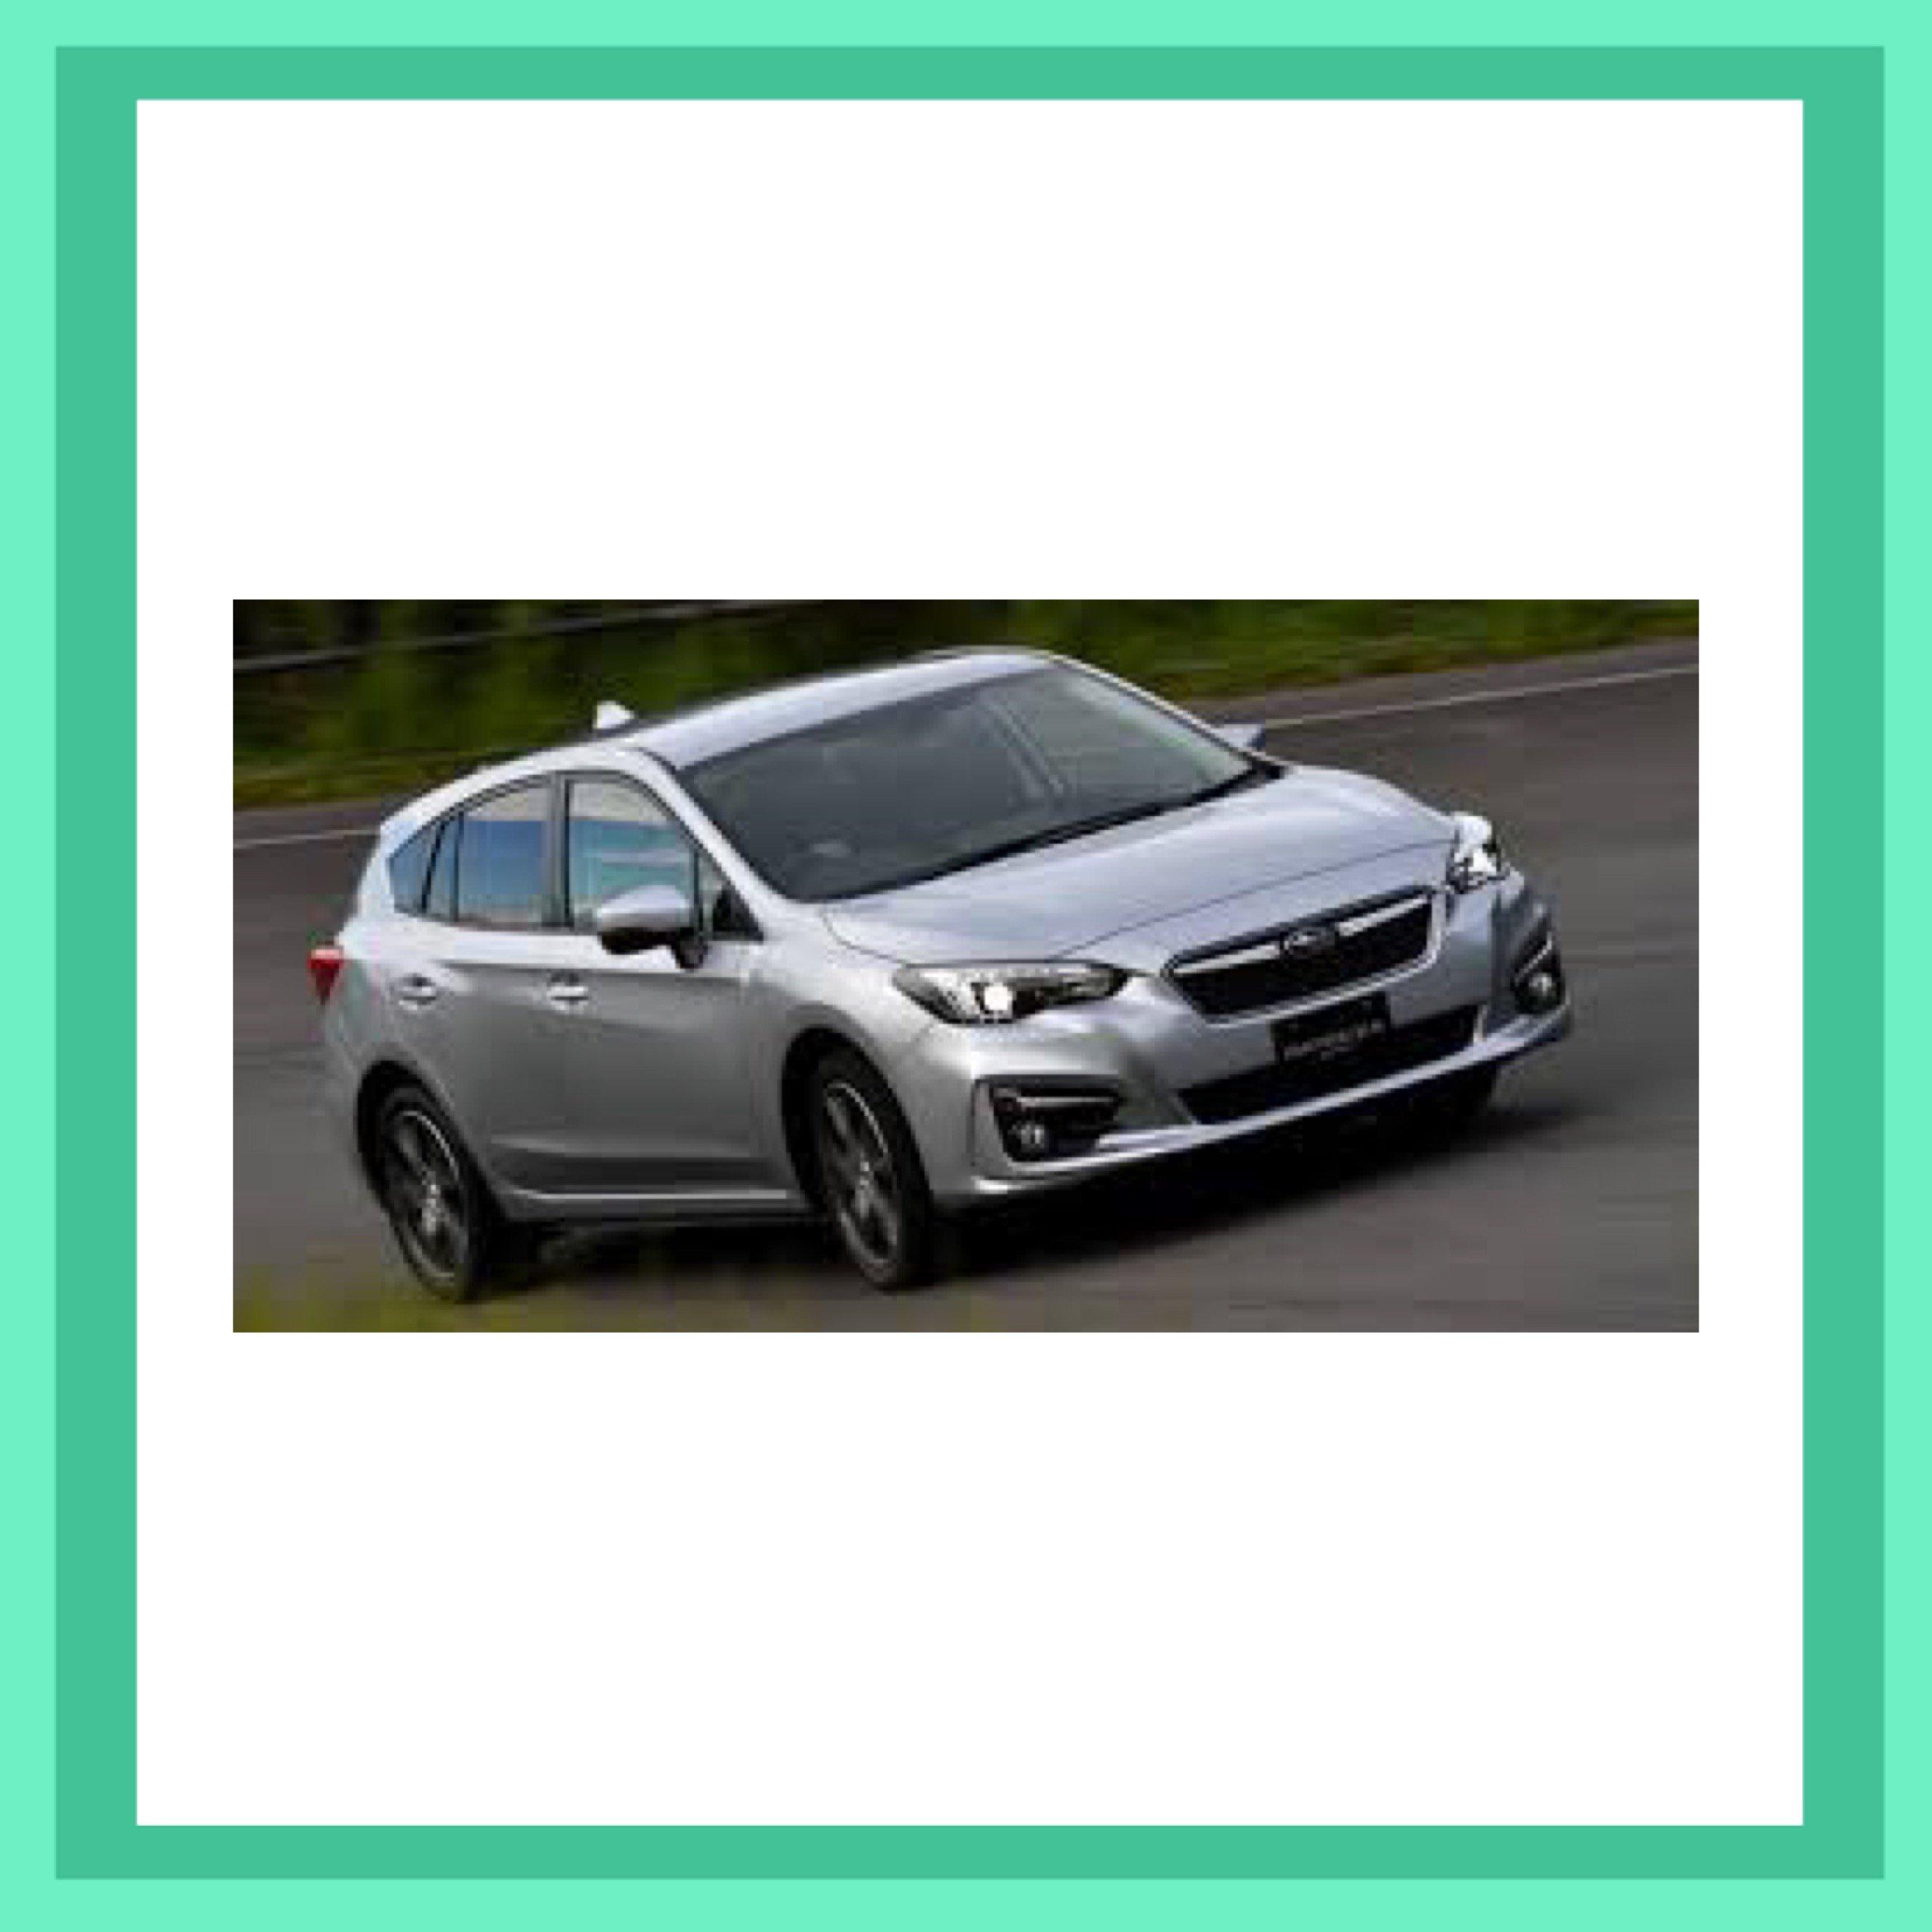 Subaru Impreza G3/GE/GV, 2008-2011